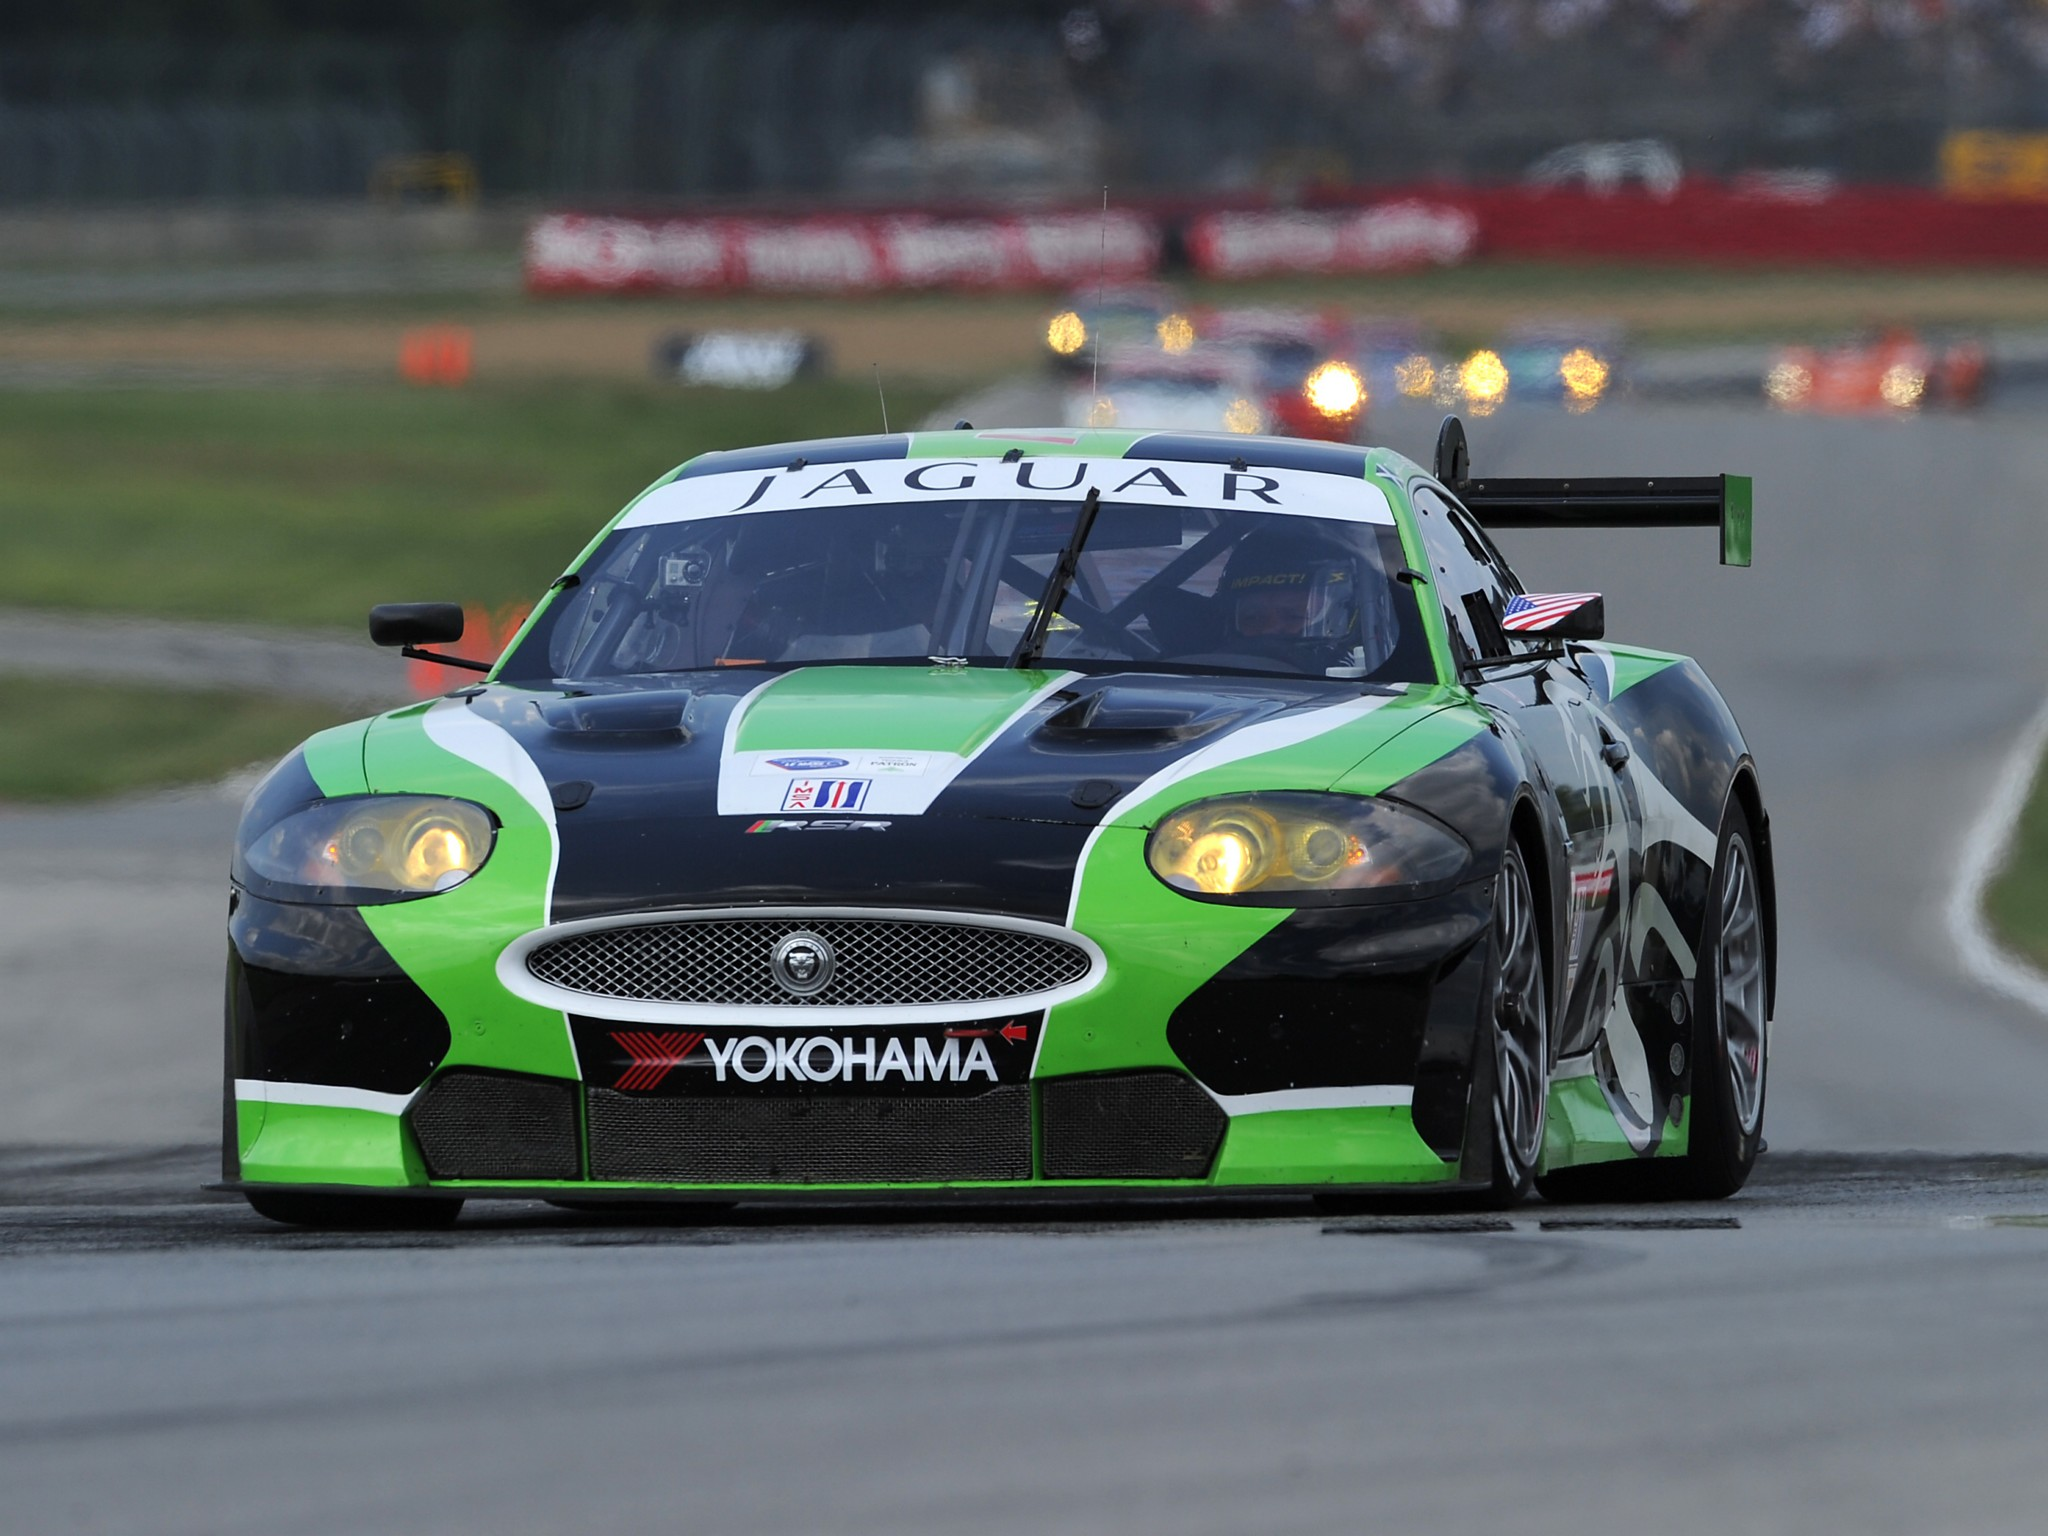 2010 Jaguar RSR XKR GT2 race racing supercar supercars tuning supercar supercars gs wallpaper ...